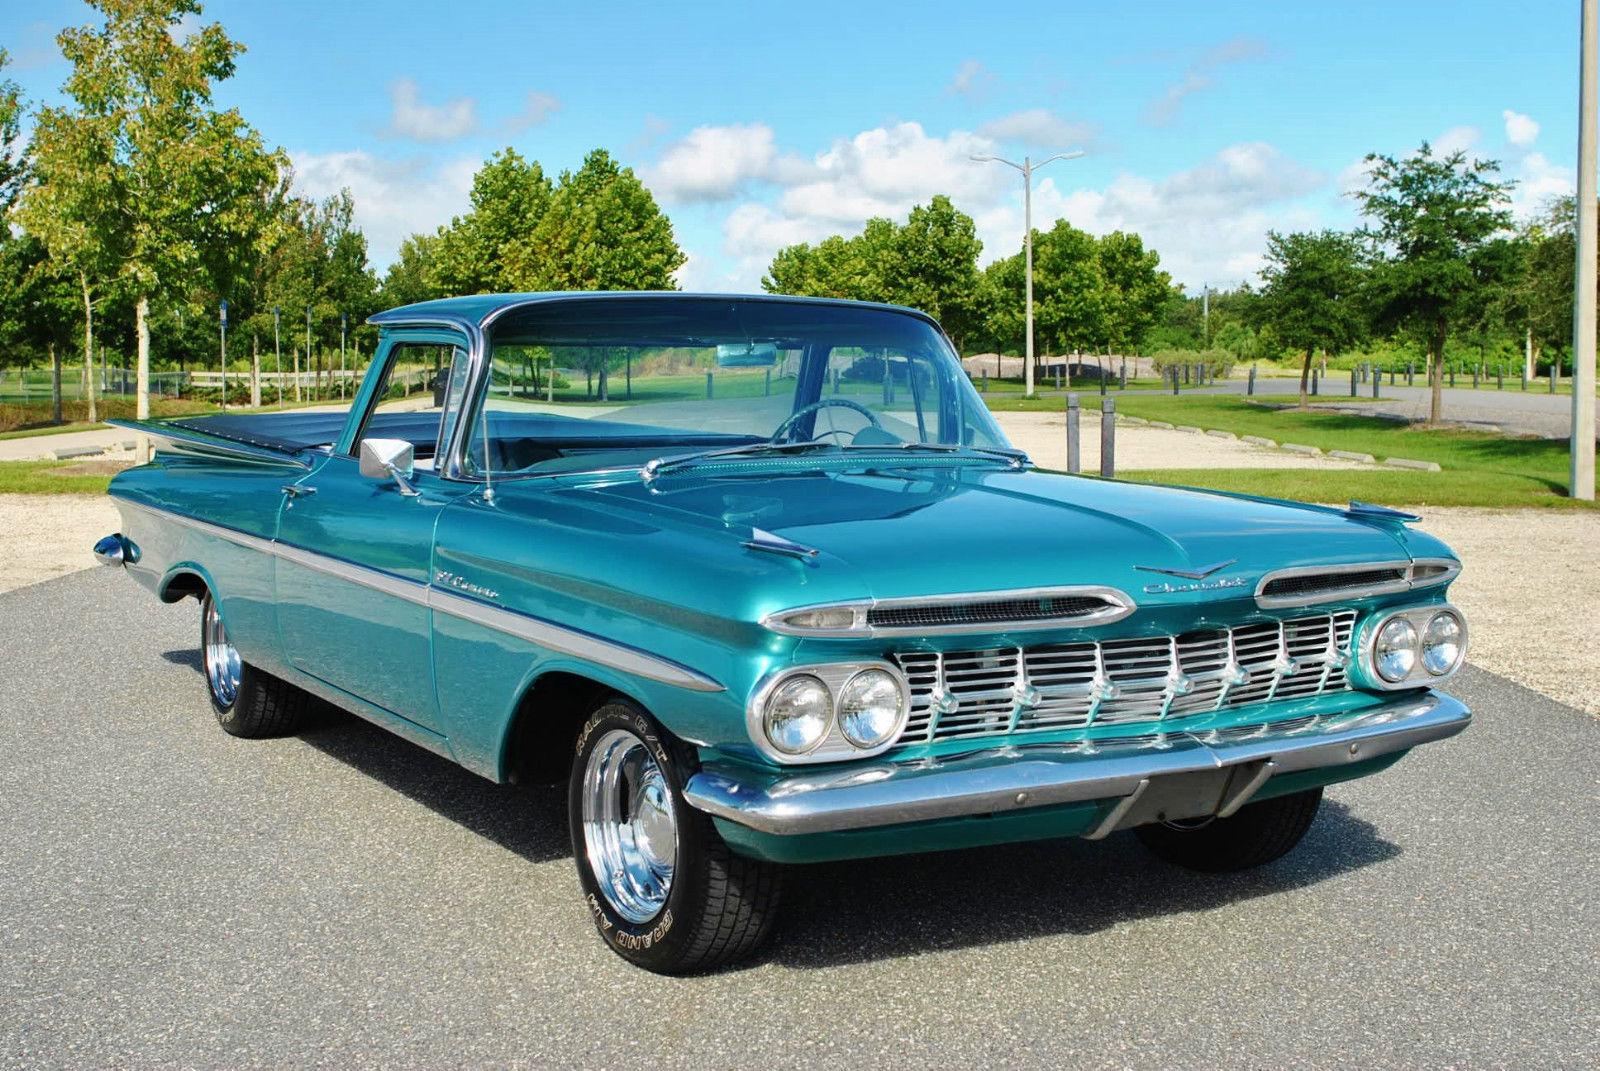 1959 chevrolet el camino v8 factory ac muscle car monday. Black Bedroom Furniture Sets. Home Design Ideas